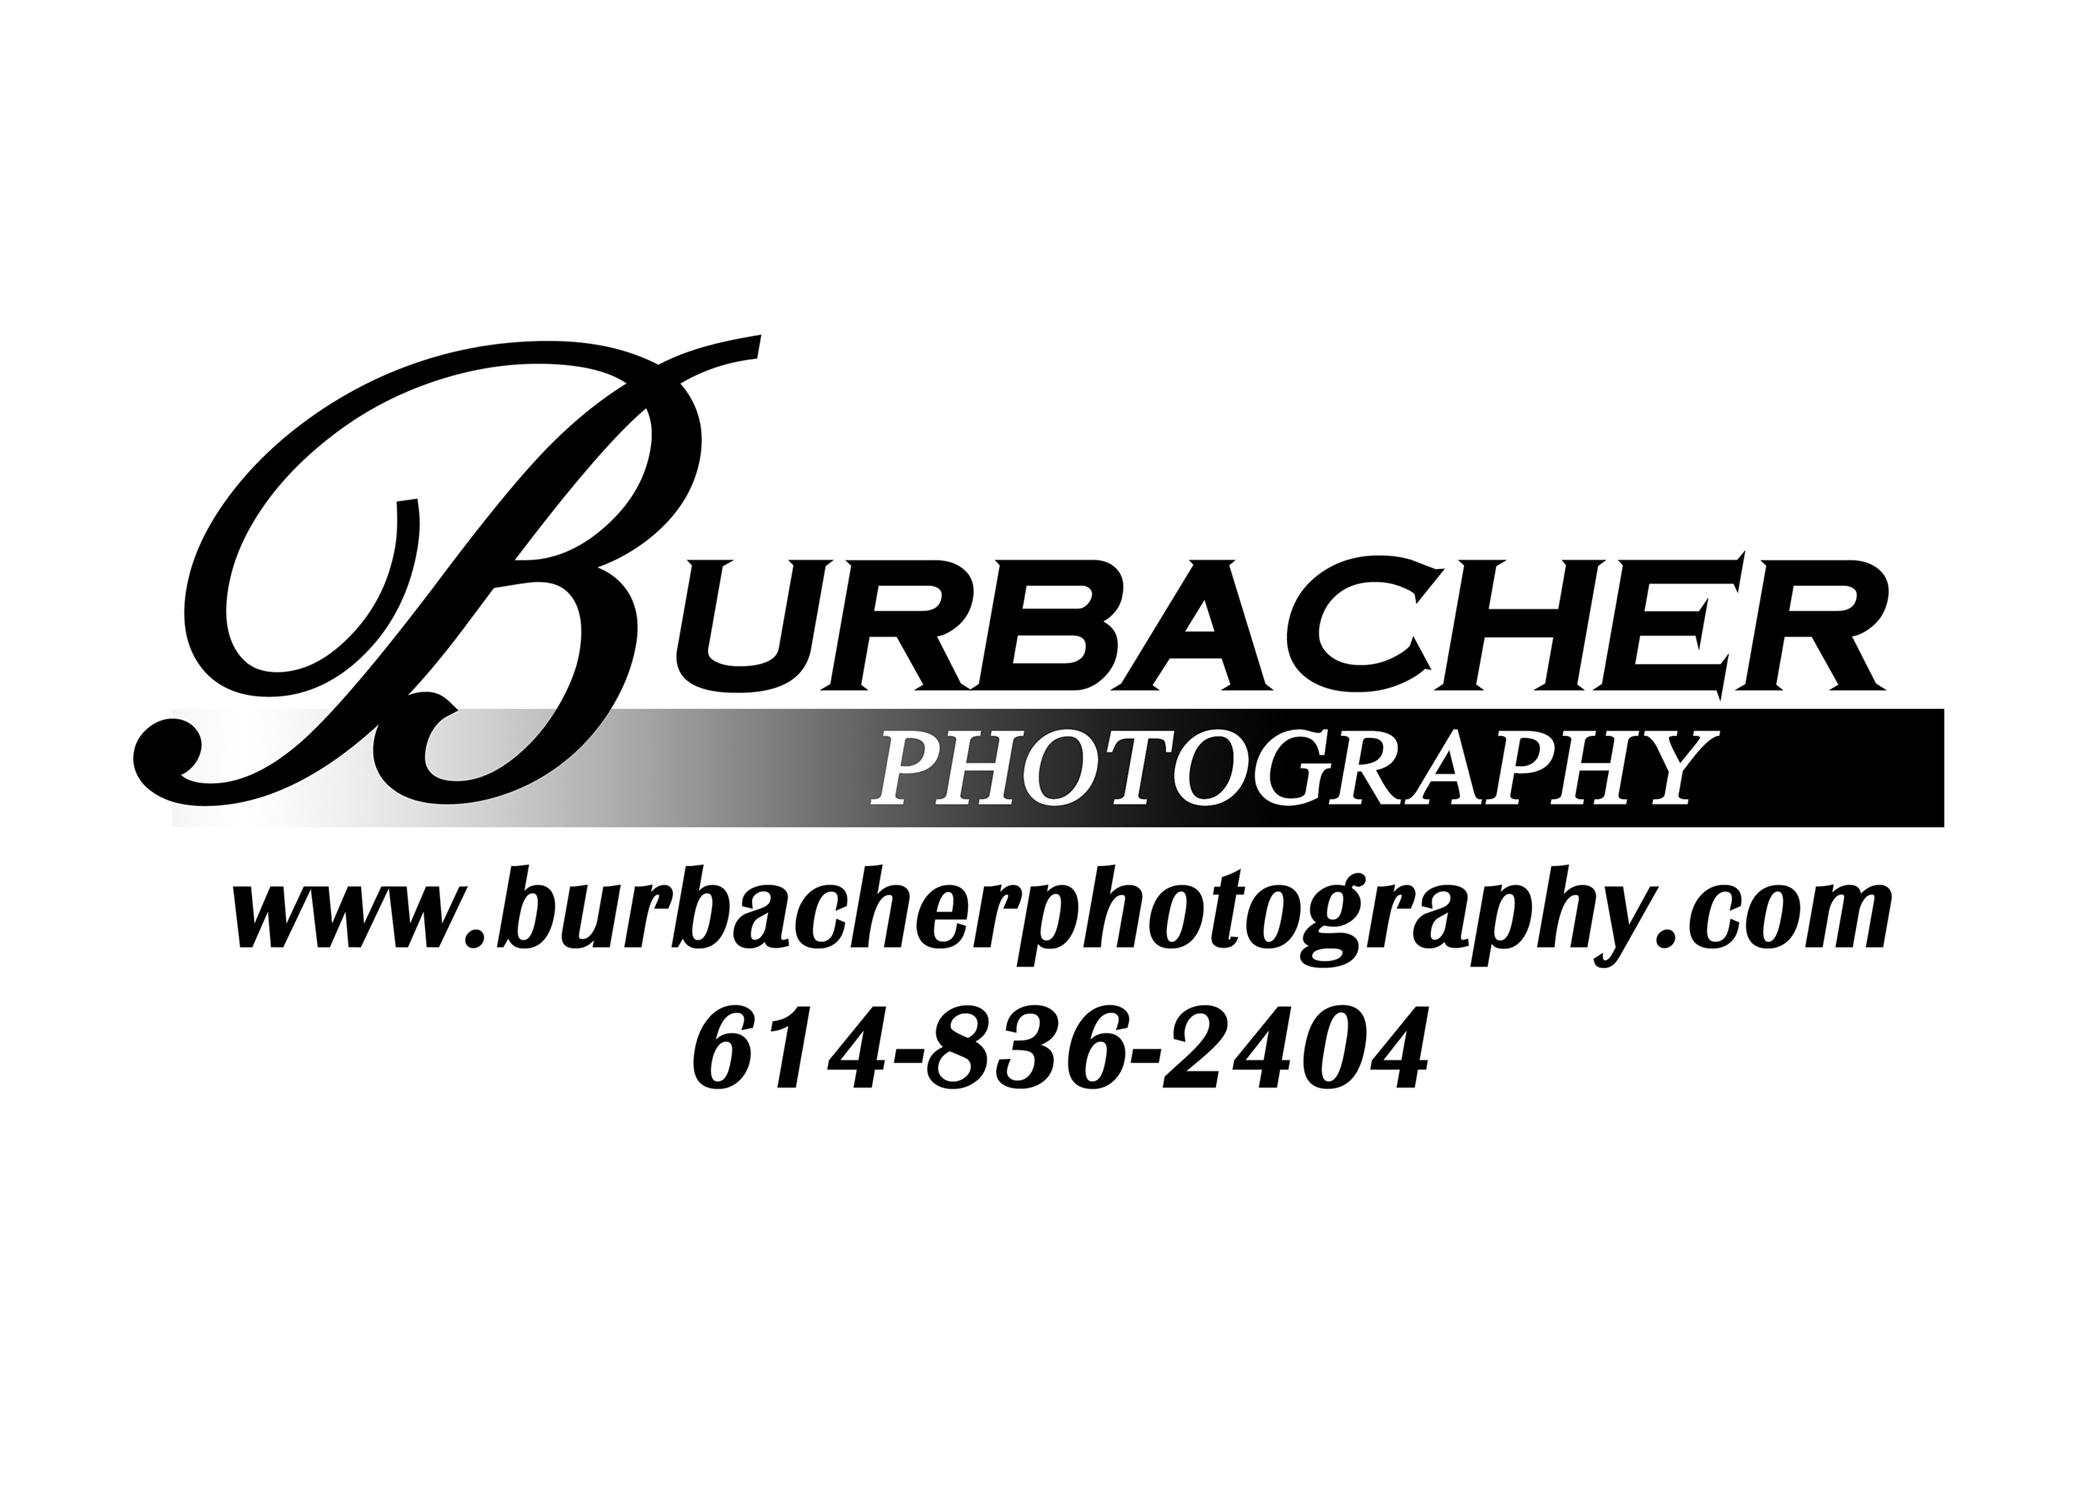 Burbacher photography